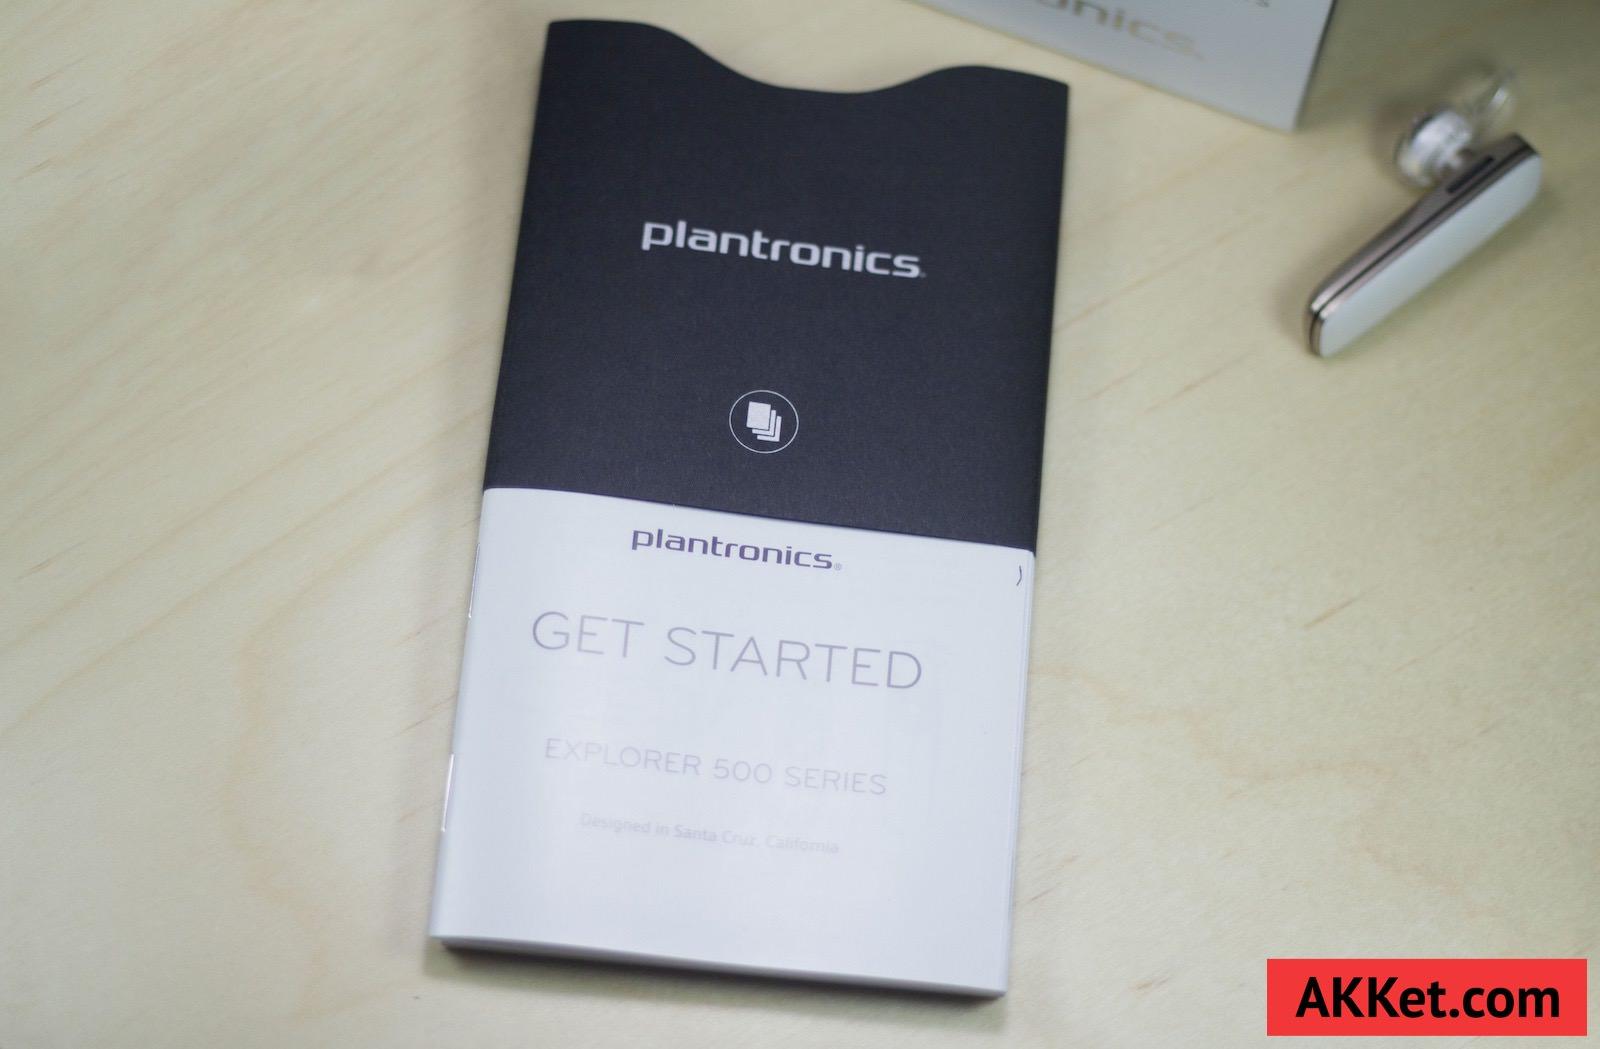 Plantronics Explorer 500 7